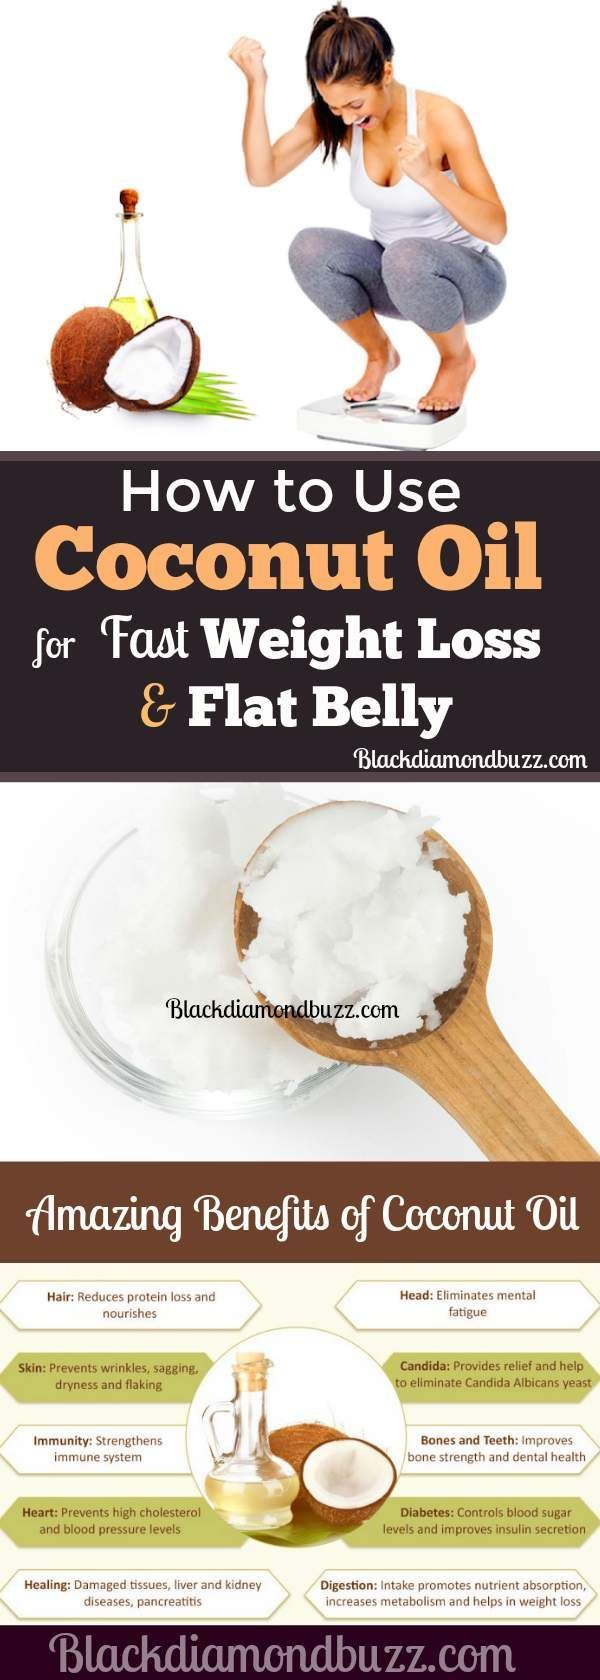 coconut oil diet plan